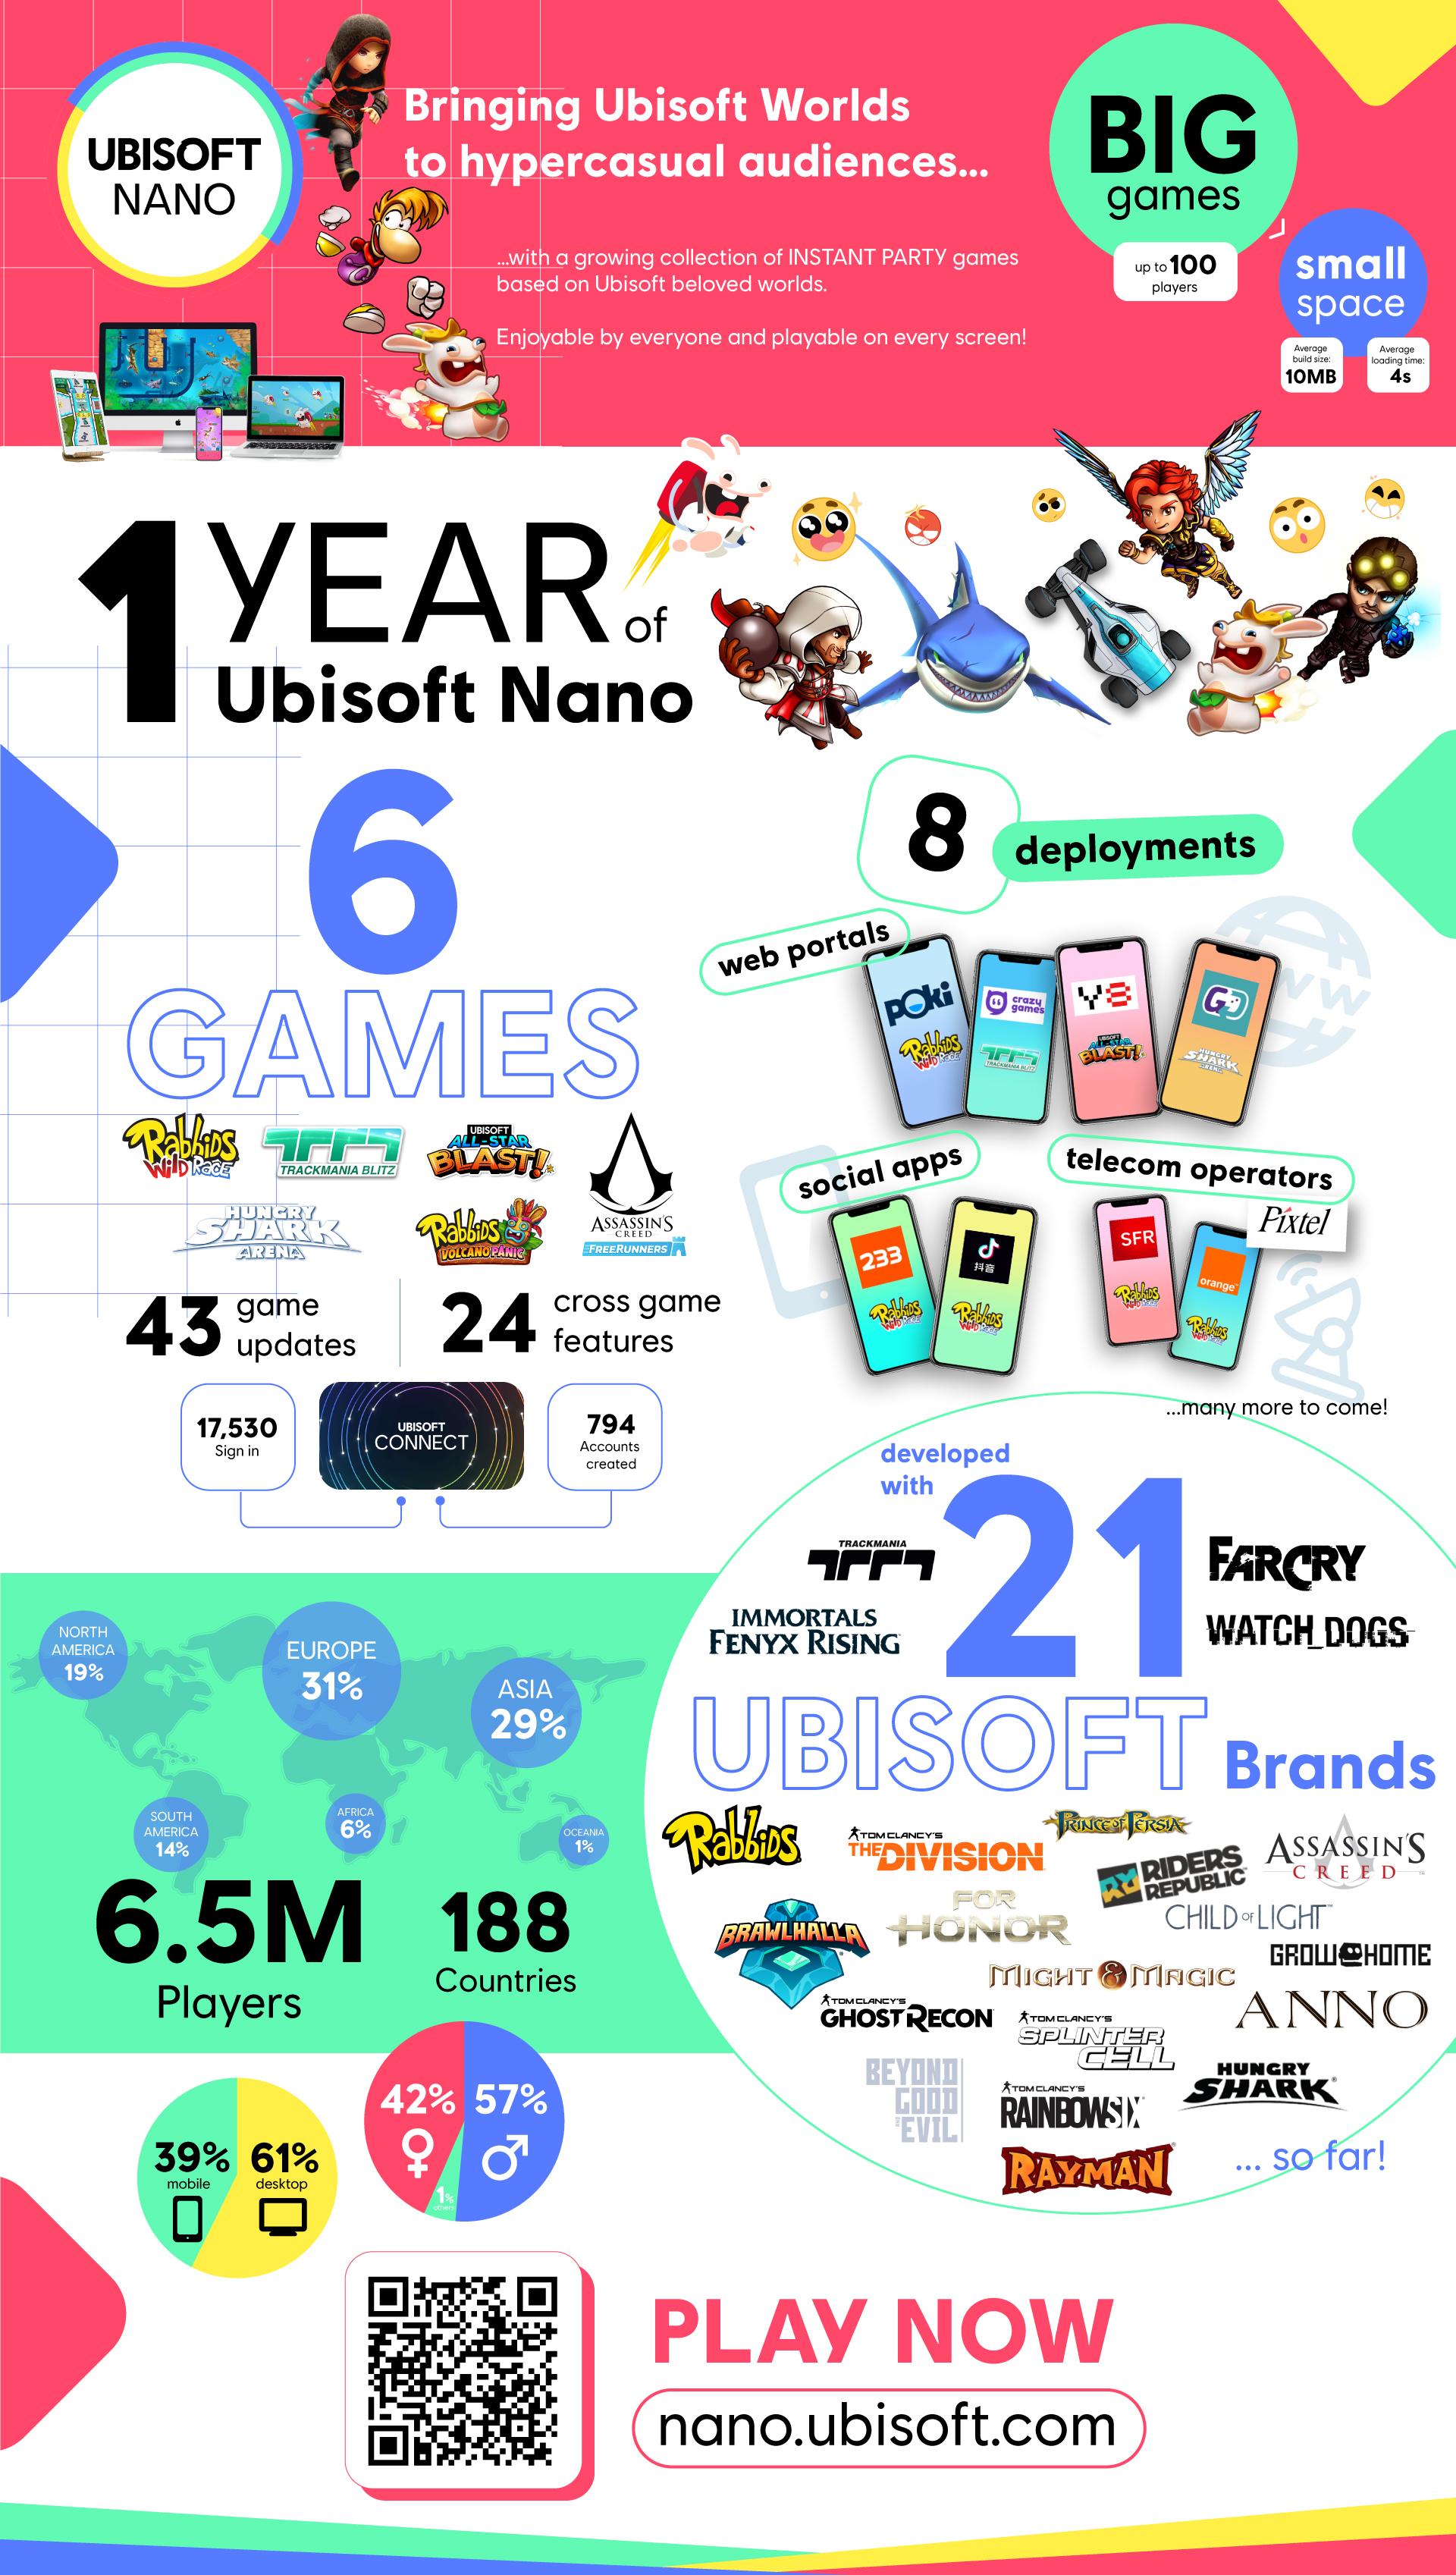 Ubisoft Nano – A Year of Games - Image 1